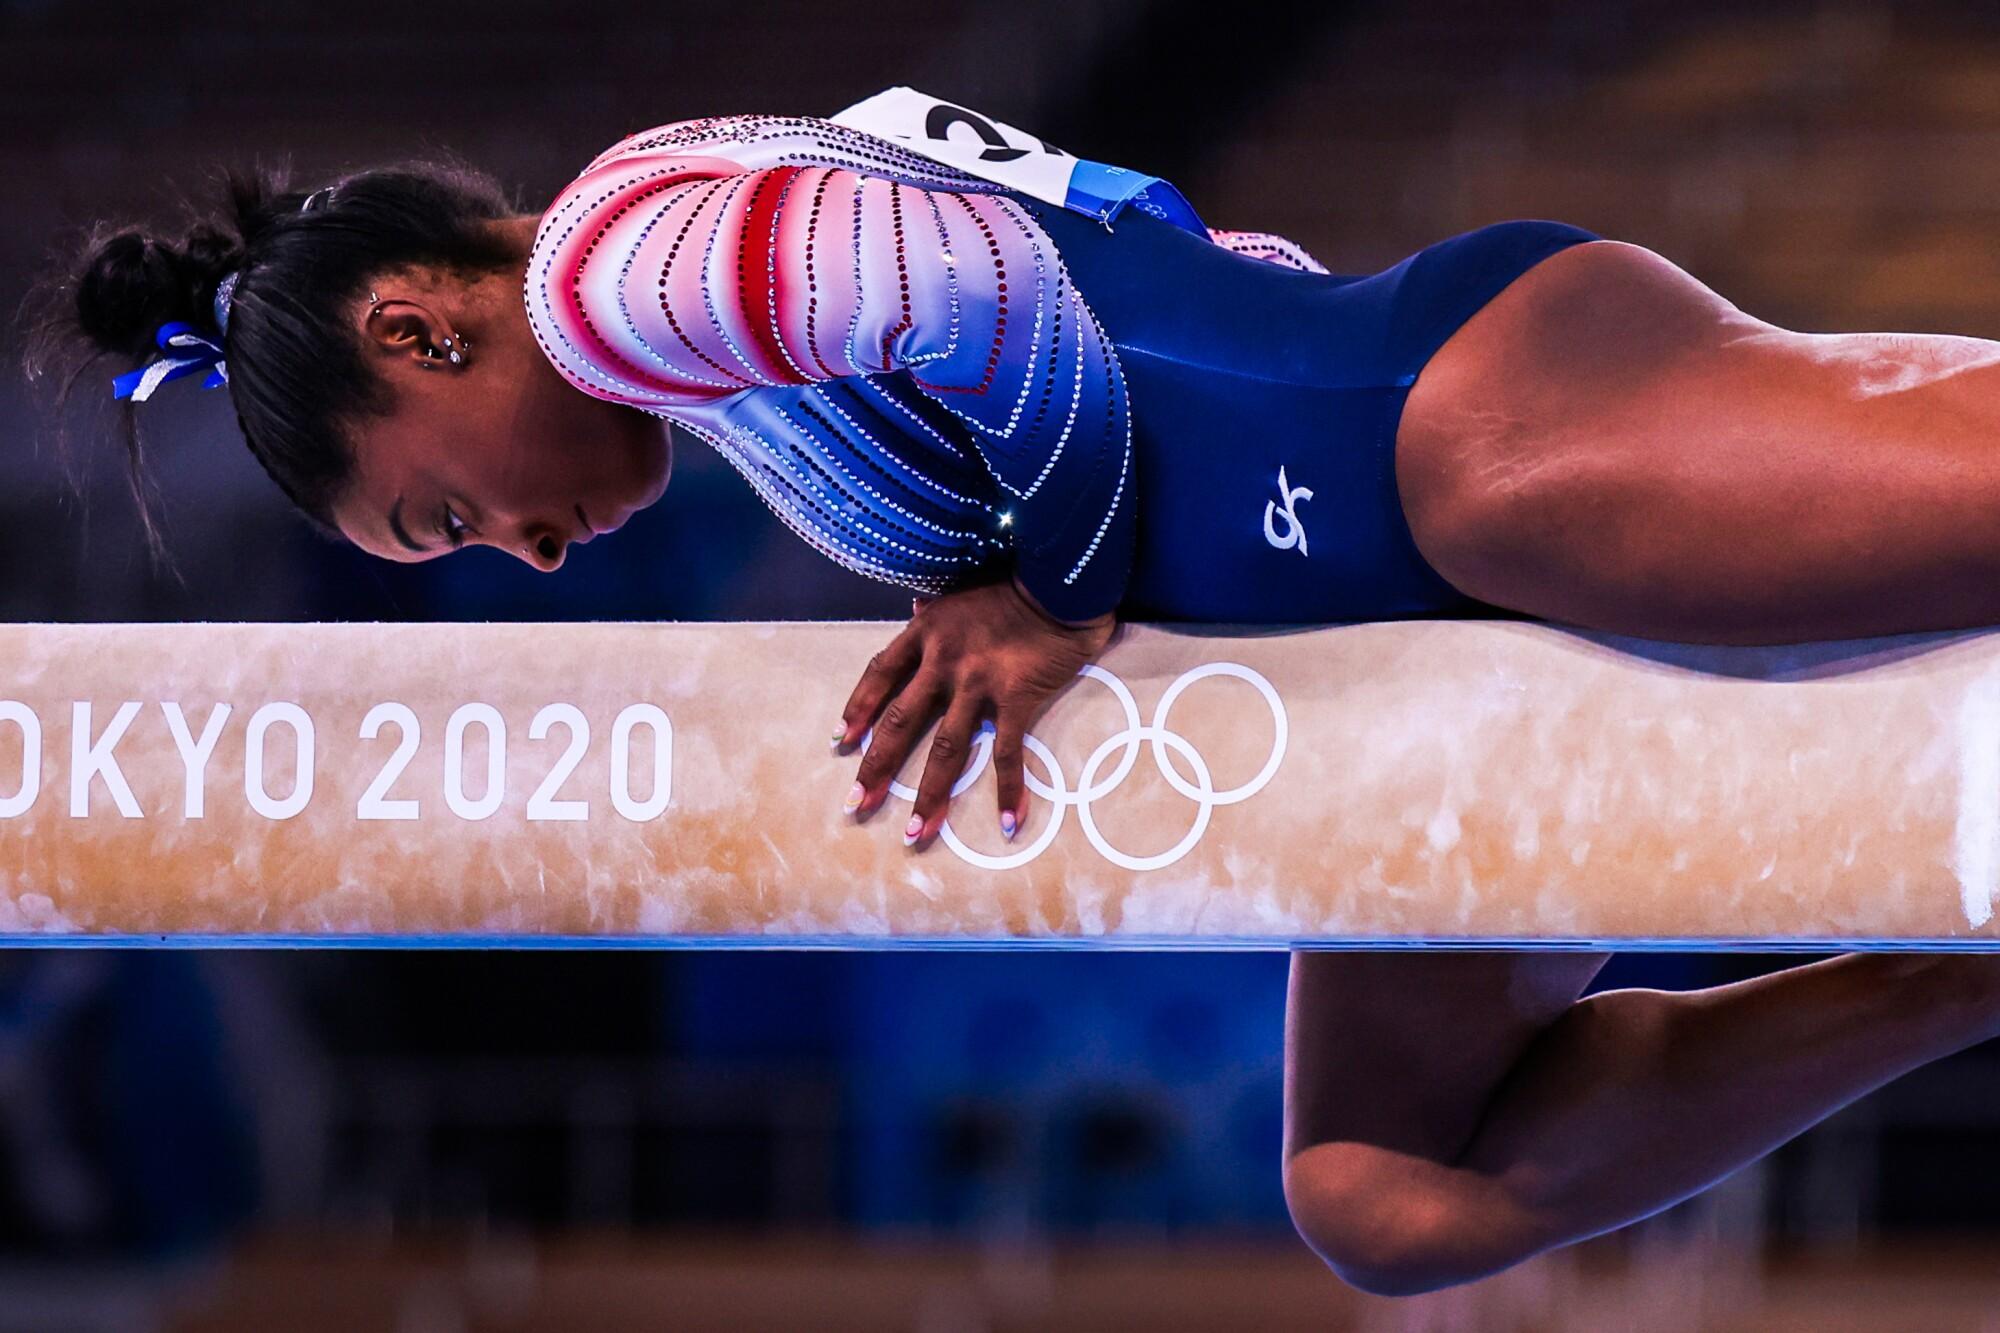 Simon Biles lies on the balance beam during her routine.